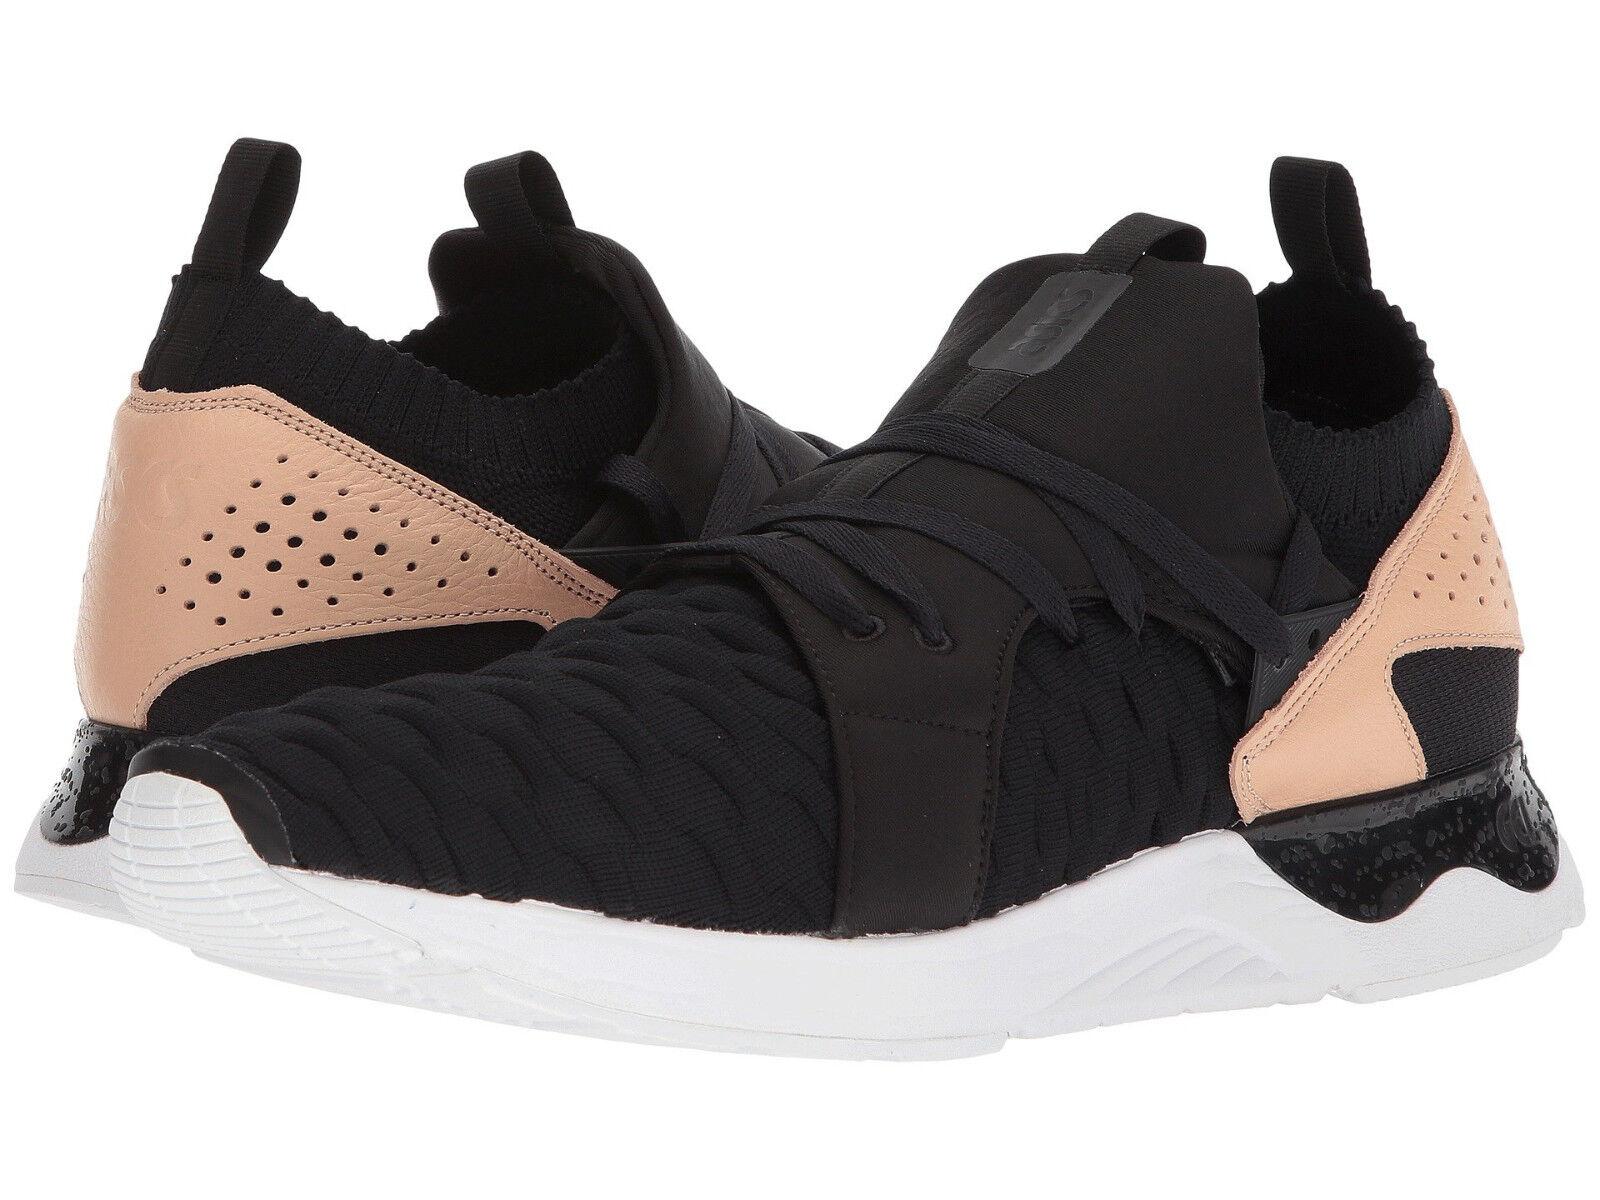 Asics Tiger Men's Gel-Lyte V Sanze Knit US 12 M Black Synthetic Sneakers $160.00